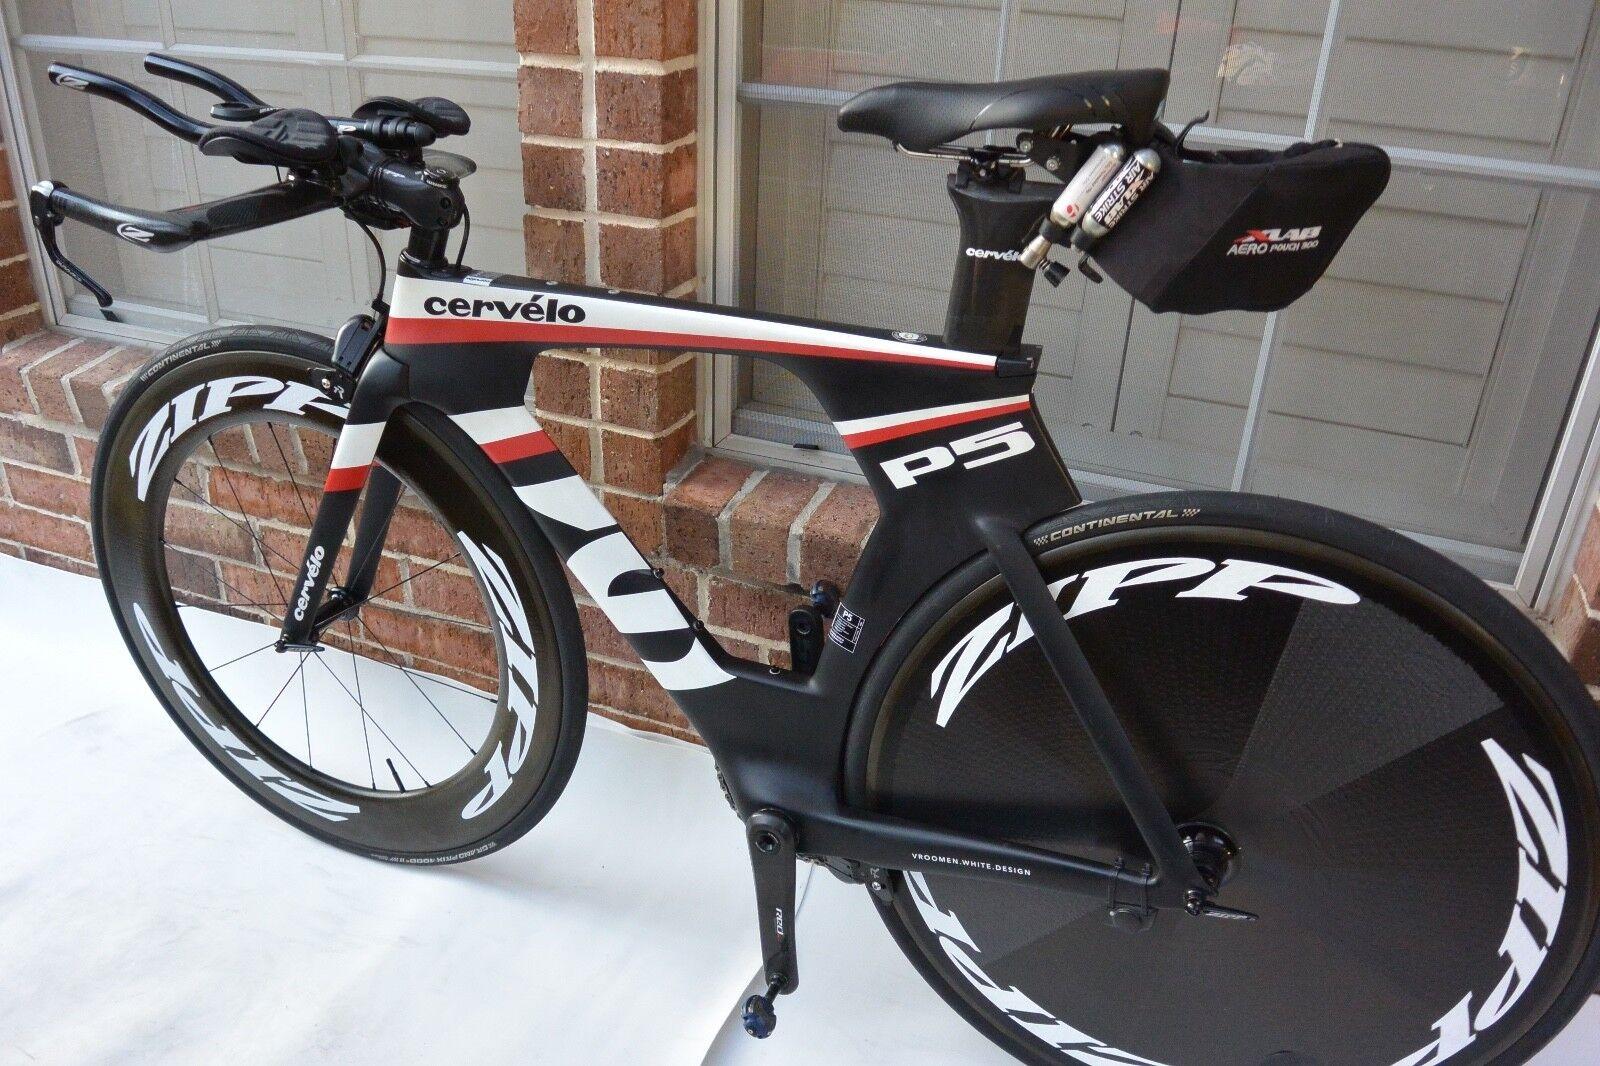 Cervelo P5 Three 51cm Sram Etap 11 Speed Carbon Aero Triathlon Bike(NO WHEELS)